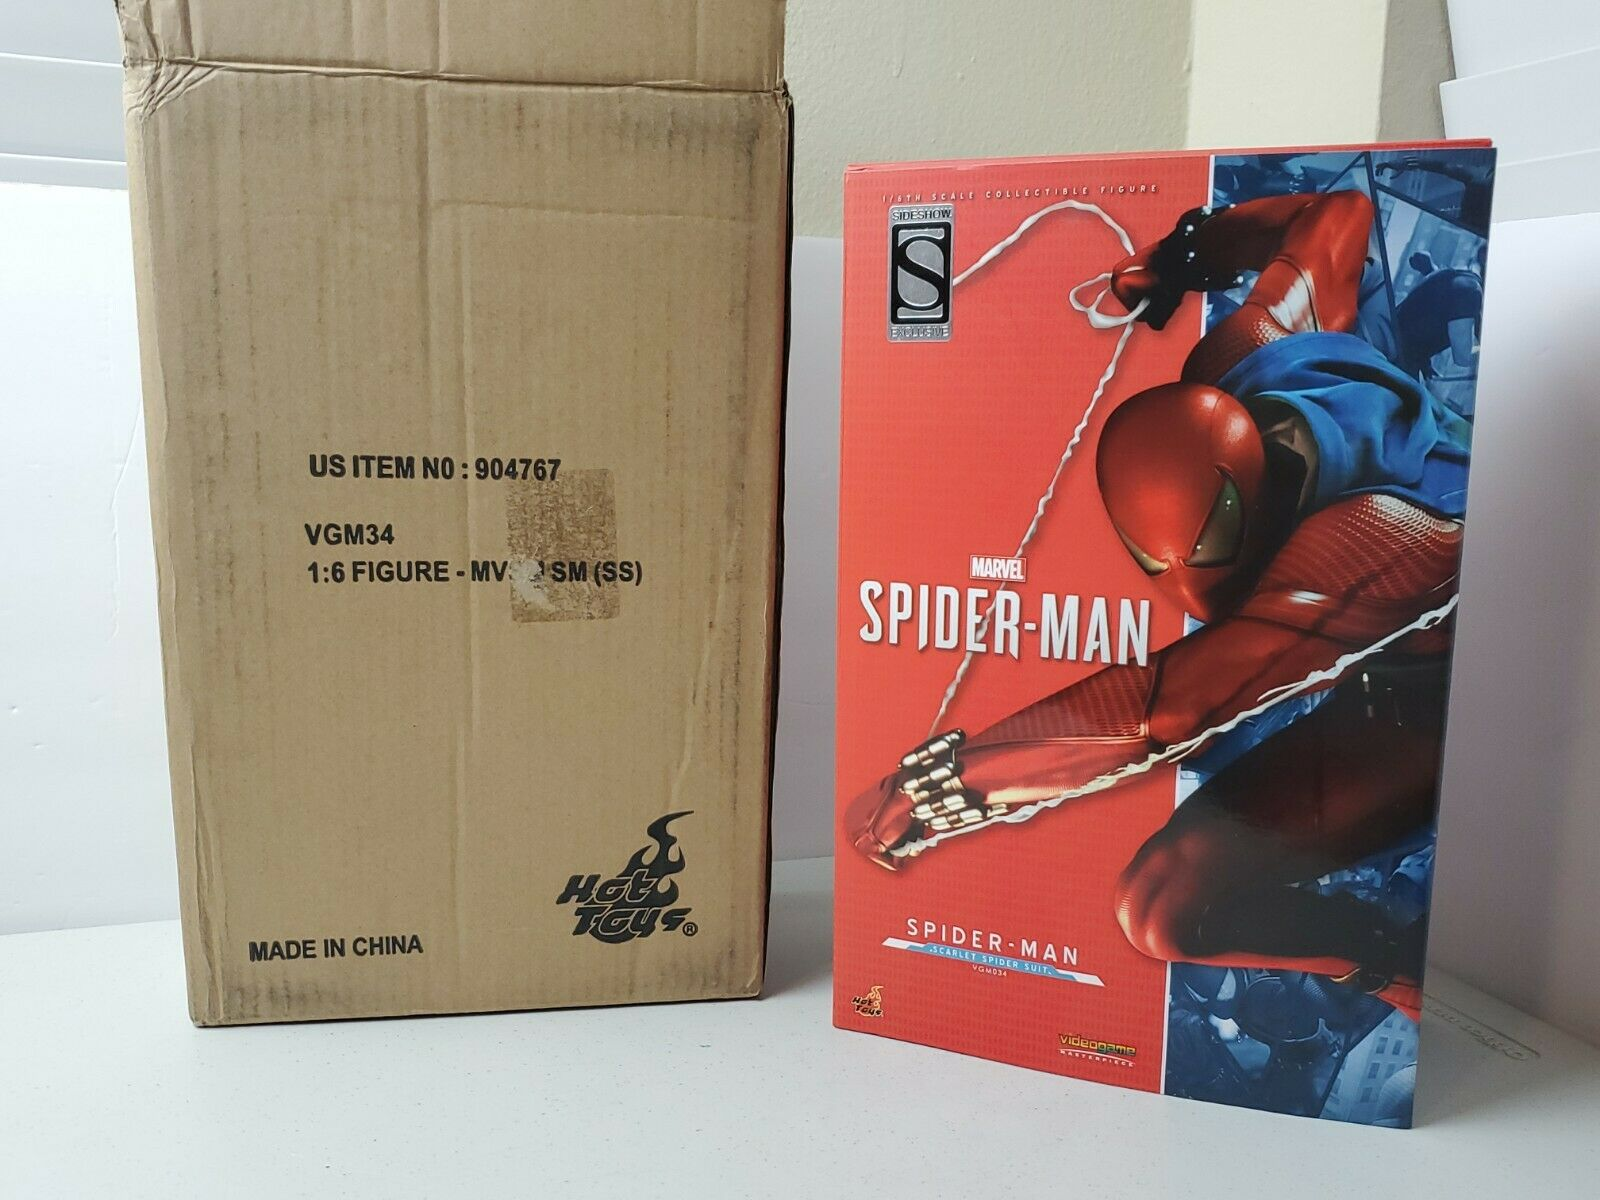 Hot Toys Marvel's Spider-Man Scarlet Spider Suit 1/6th VGM34 - USA Seller! on eBay thumbnail